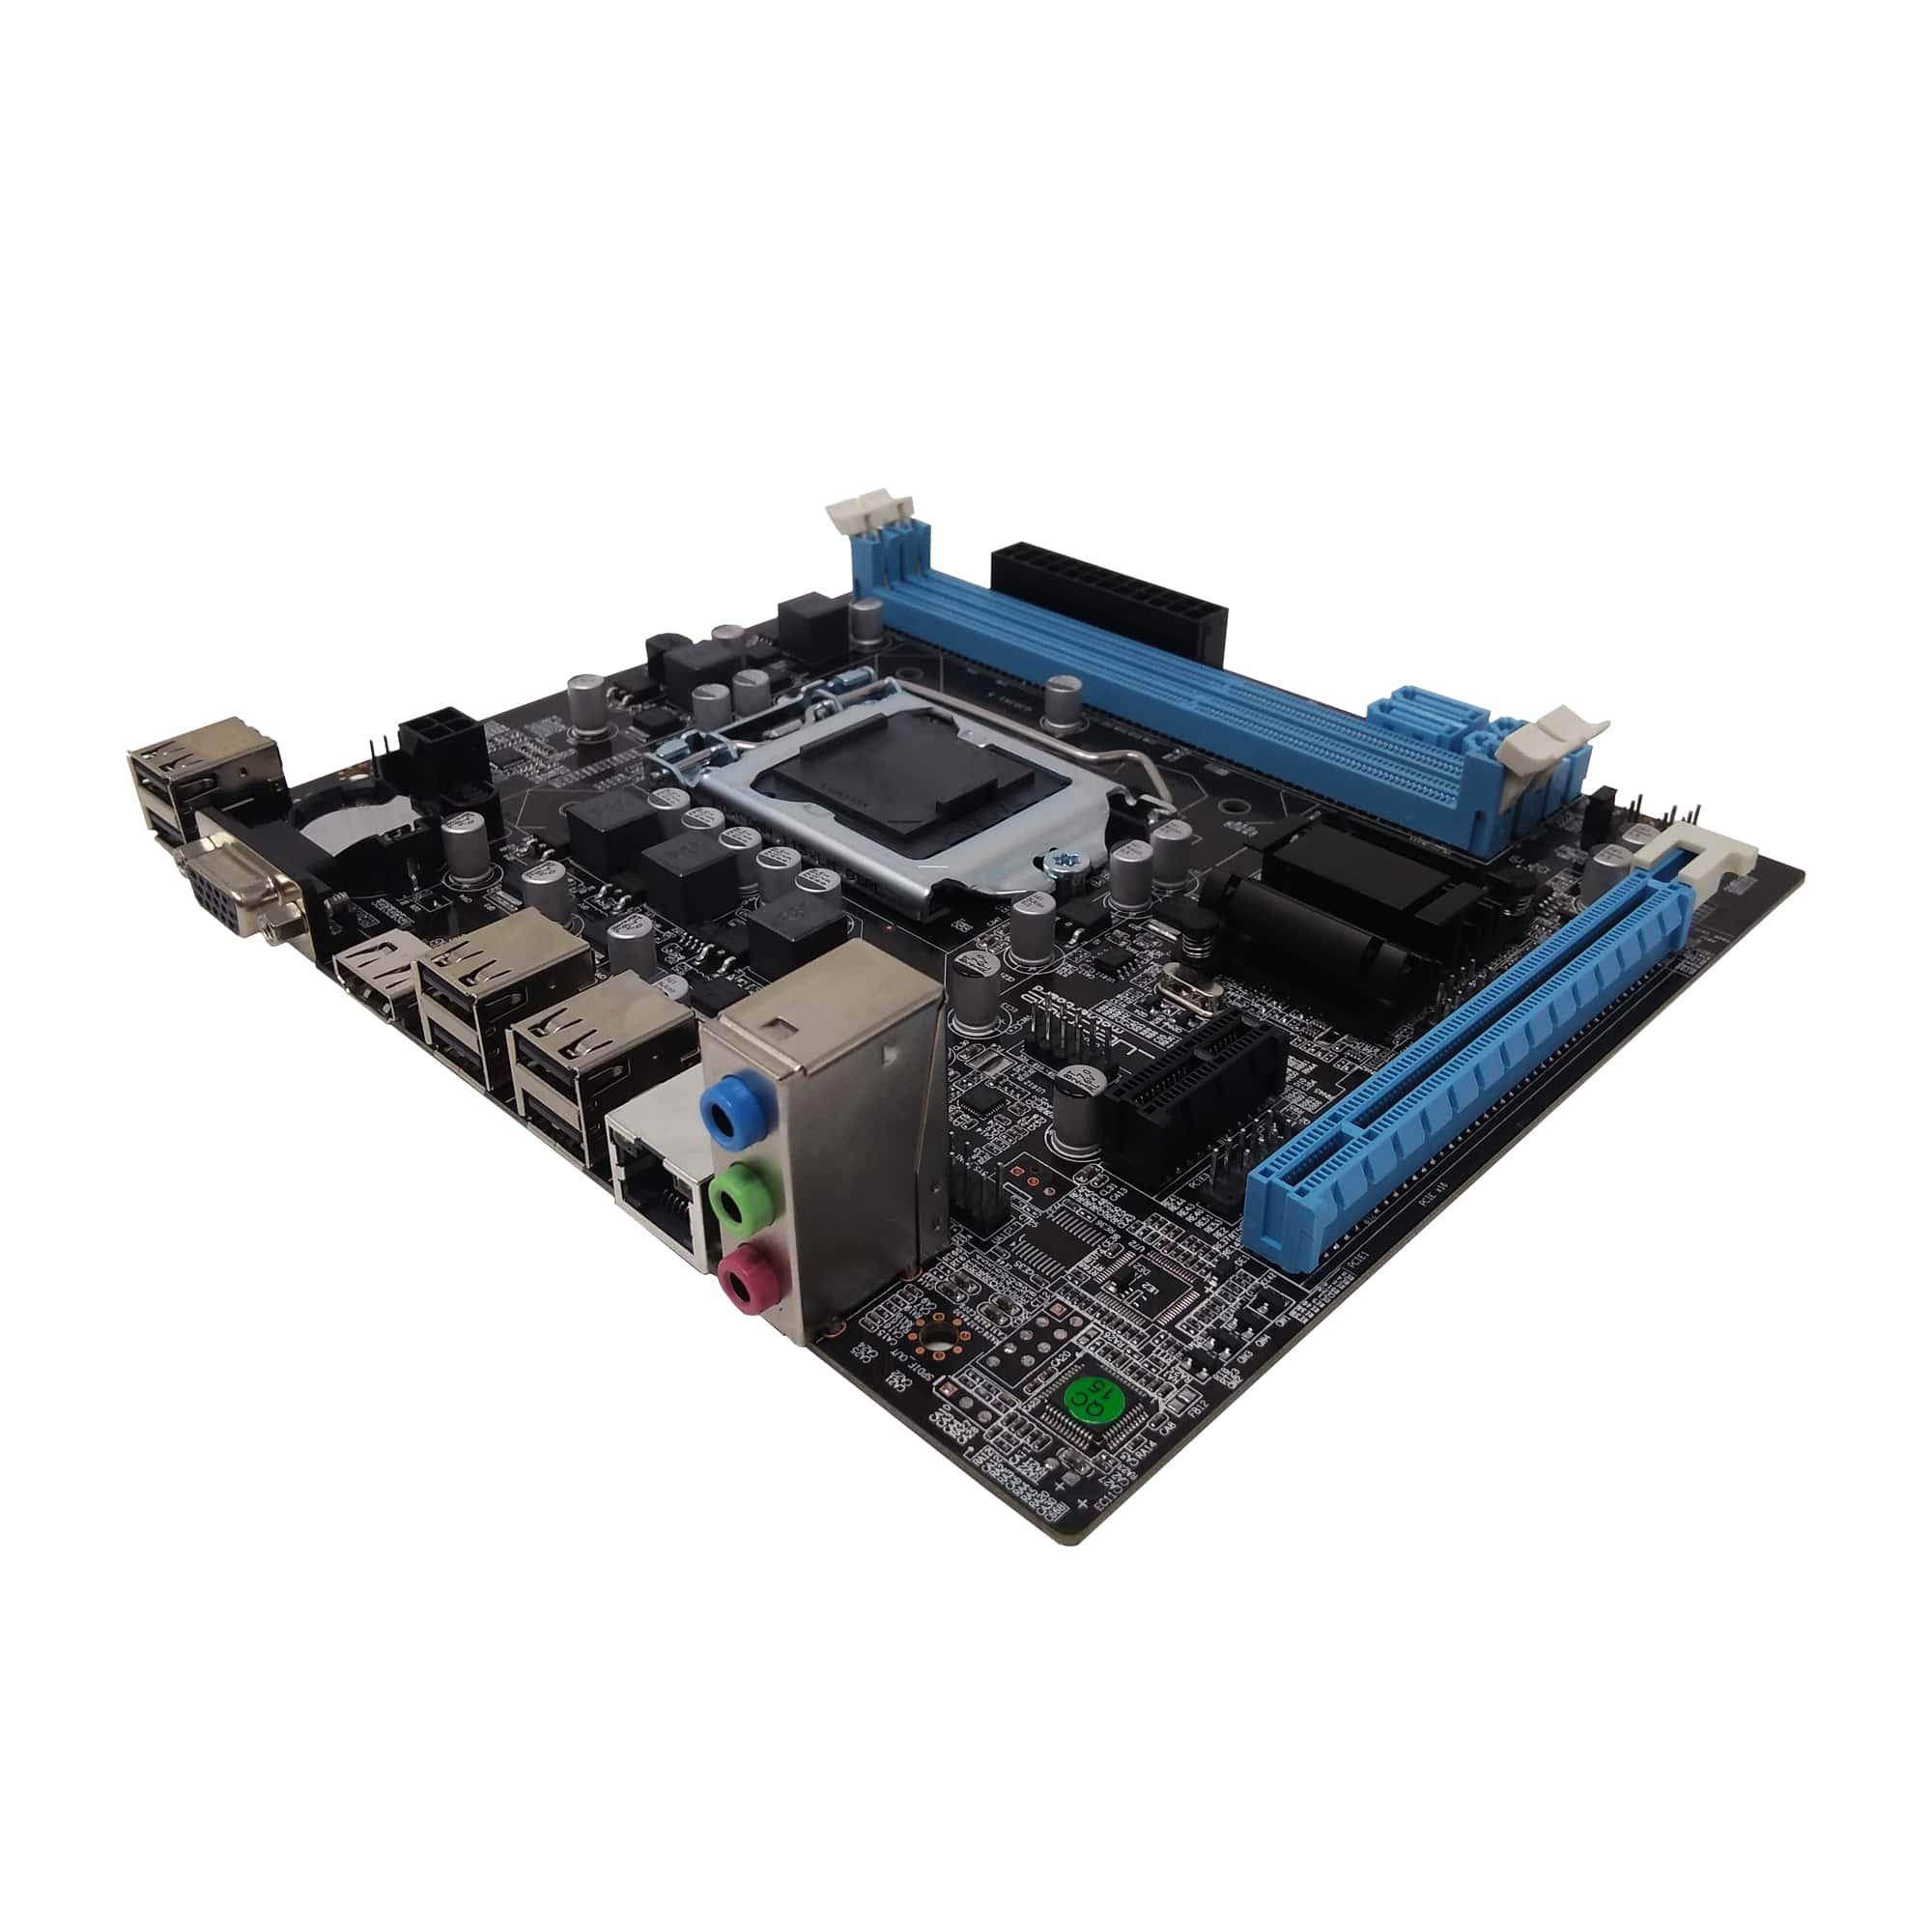 Placa-Mãe Bluecase BMBH61-T, LGA1155, DDR3.